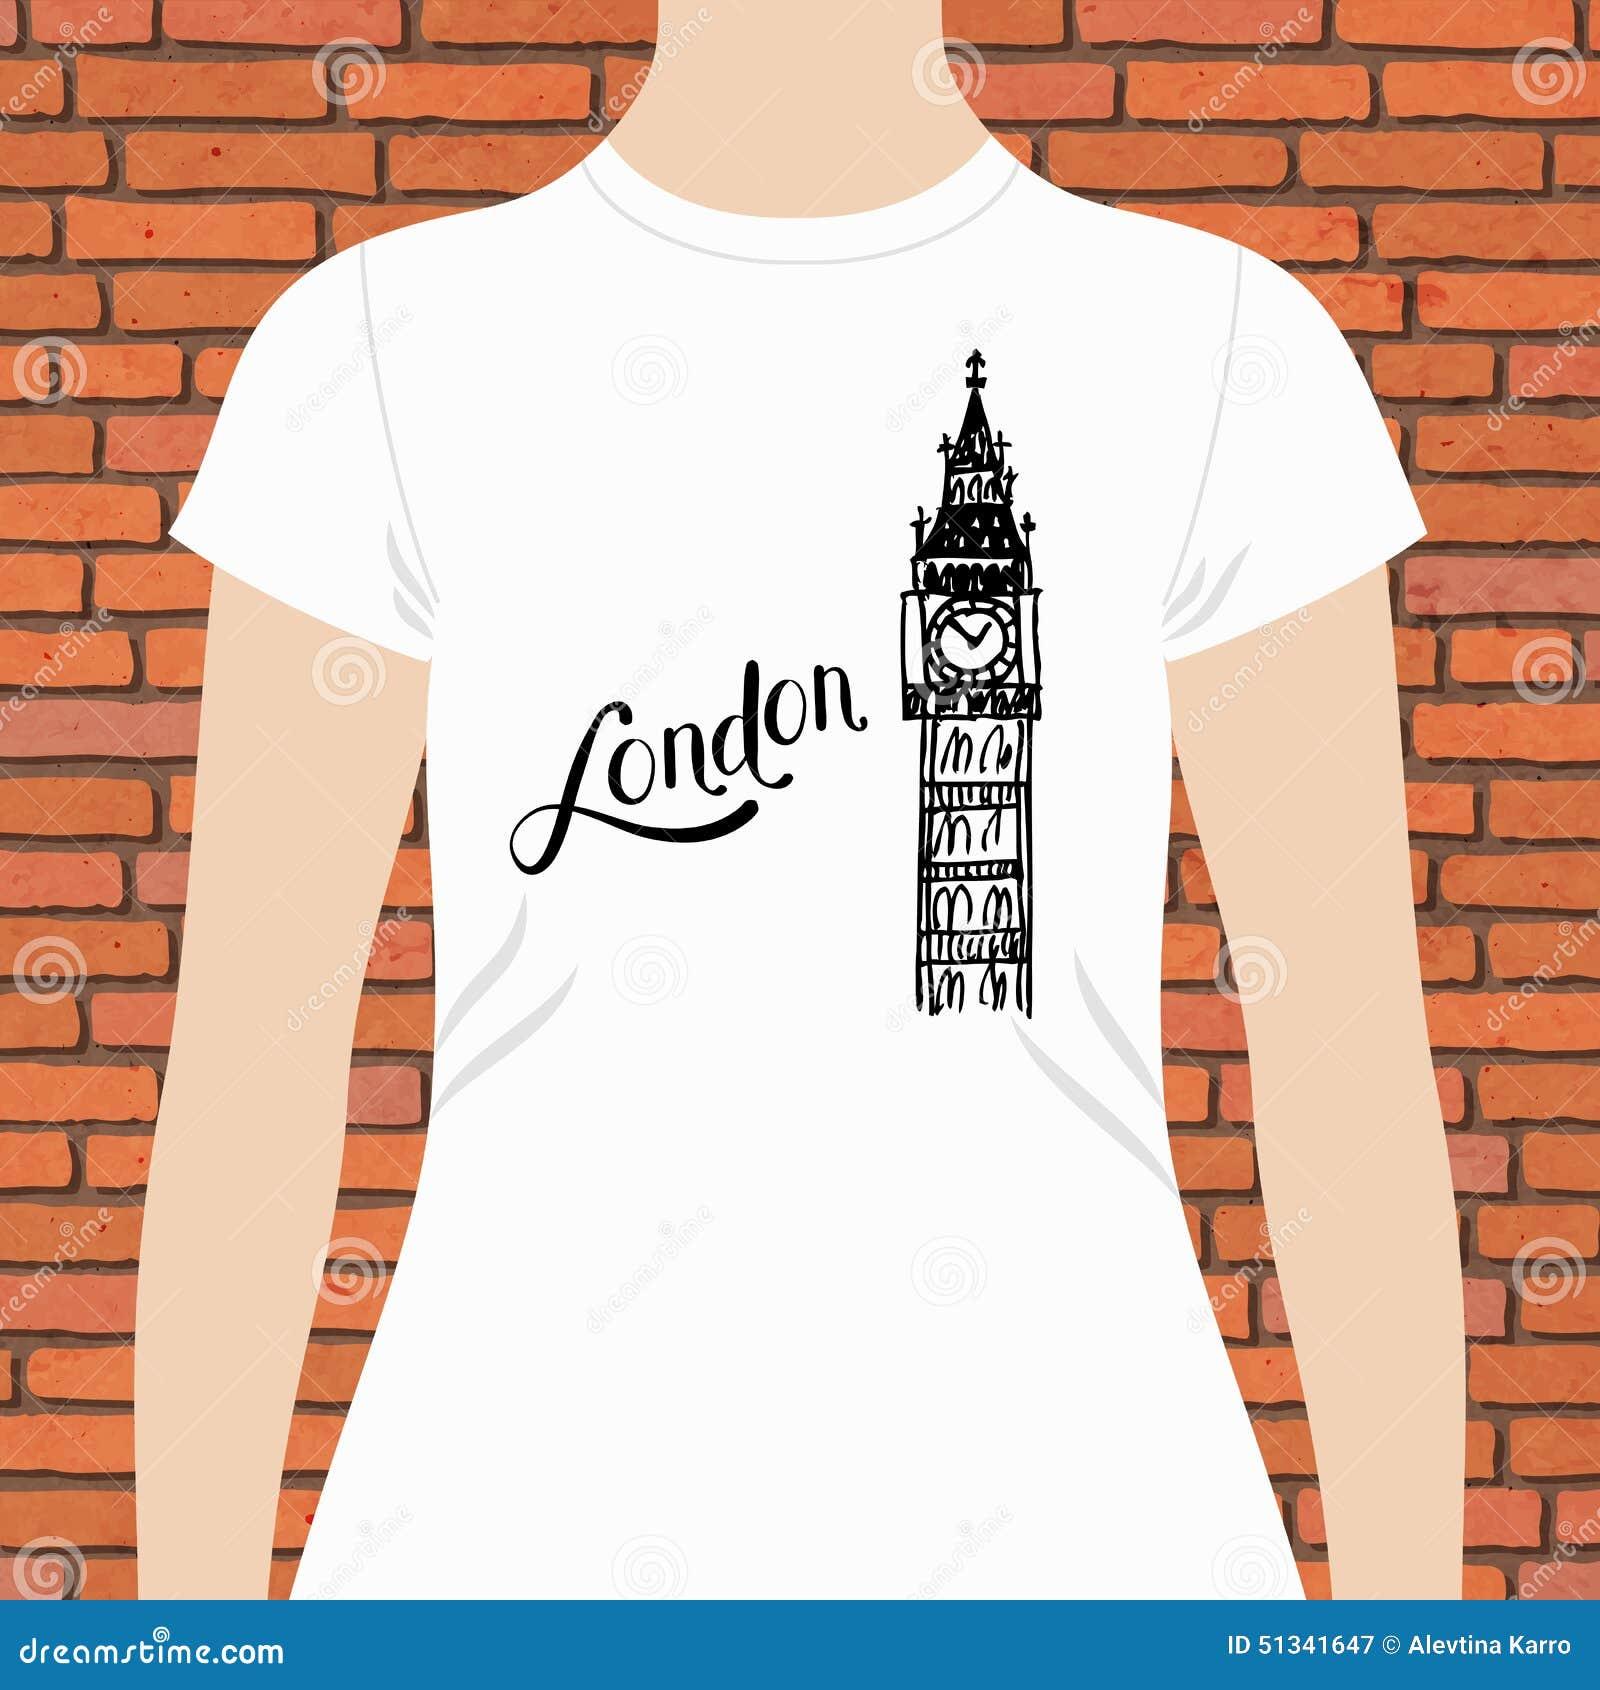 Shirt design london - Simple London Shirt With Big Ben Tower Design